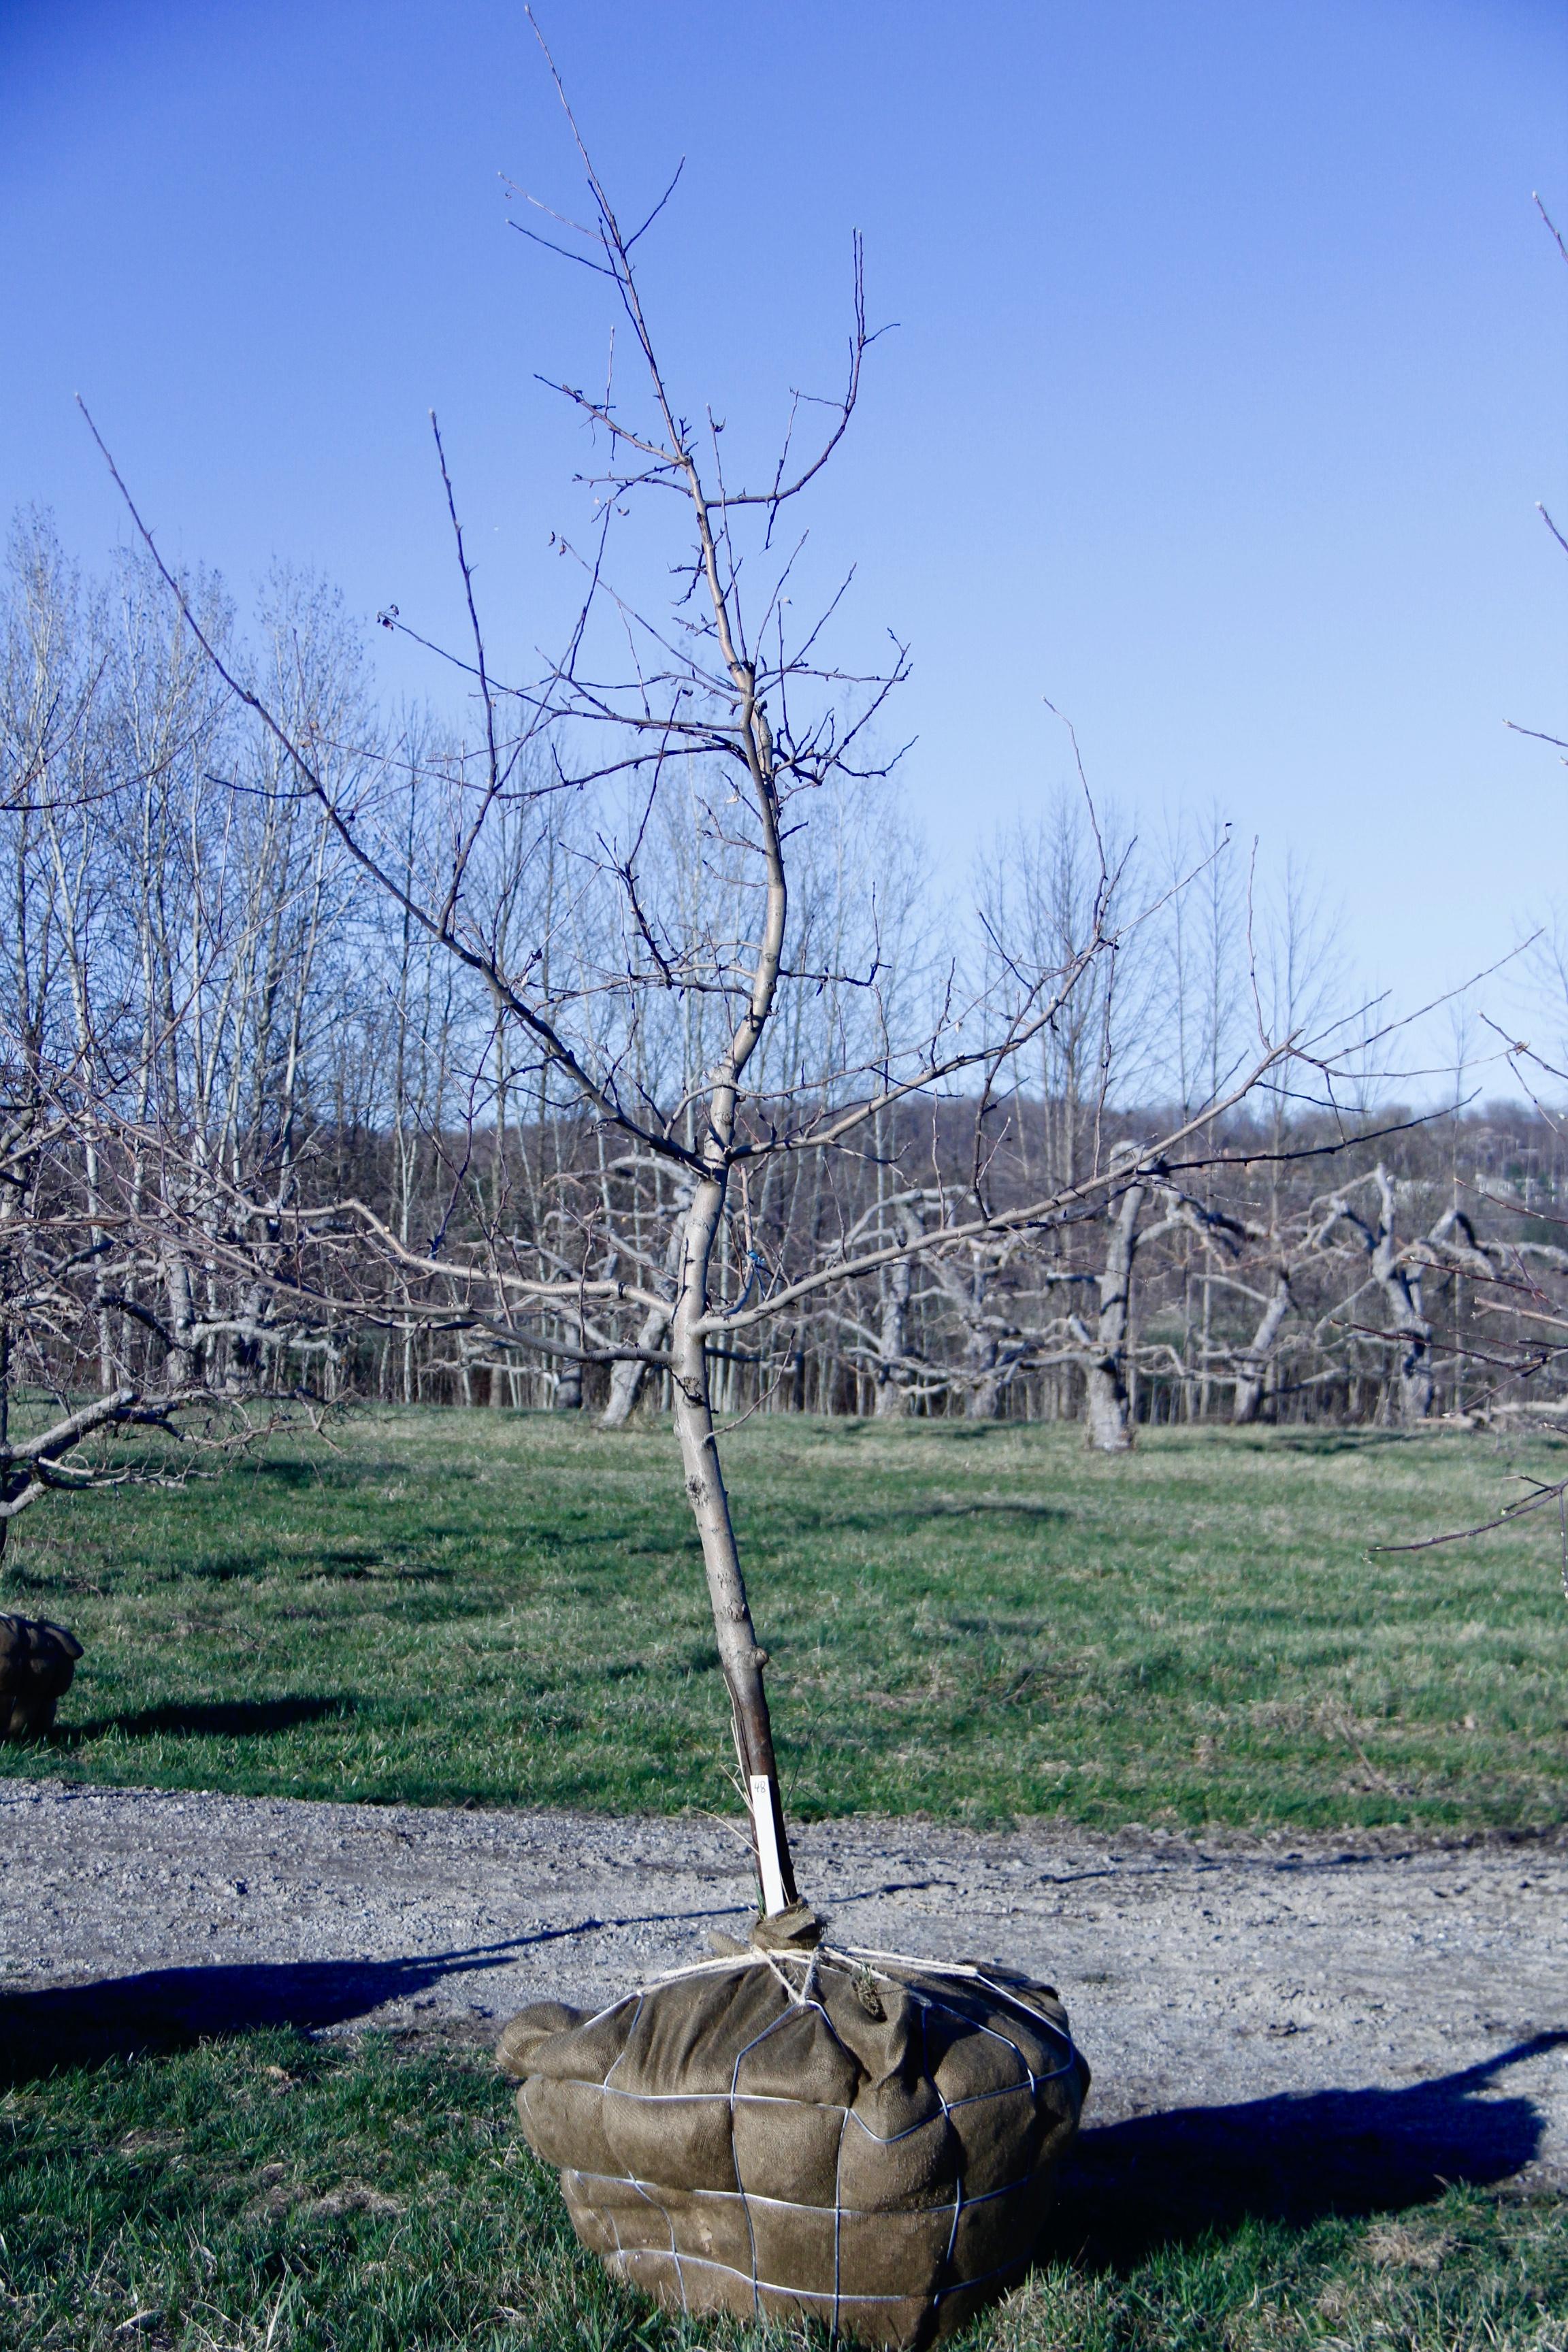 #48 - Golden Delicious, Apple Tree - 2